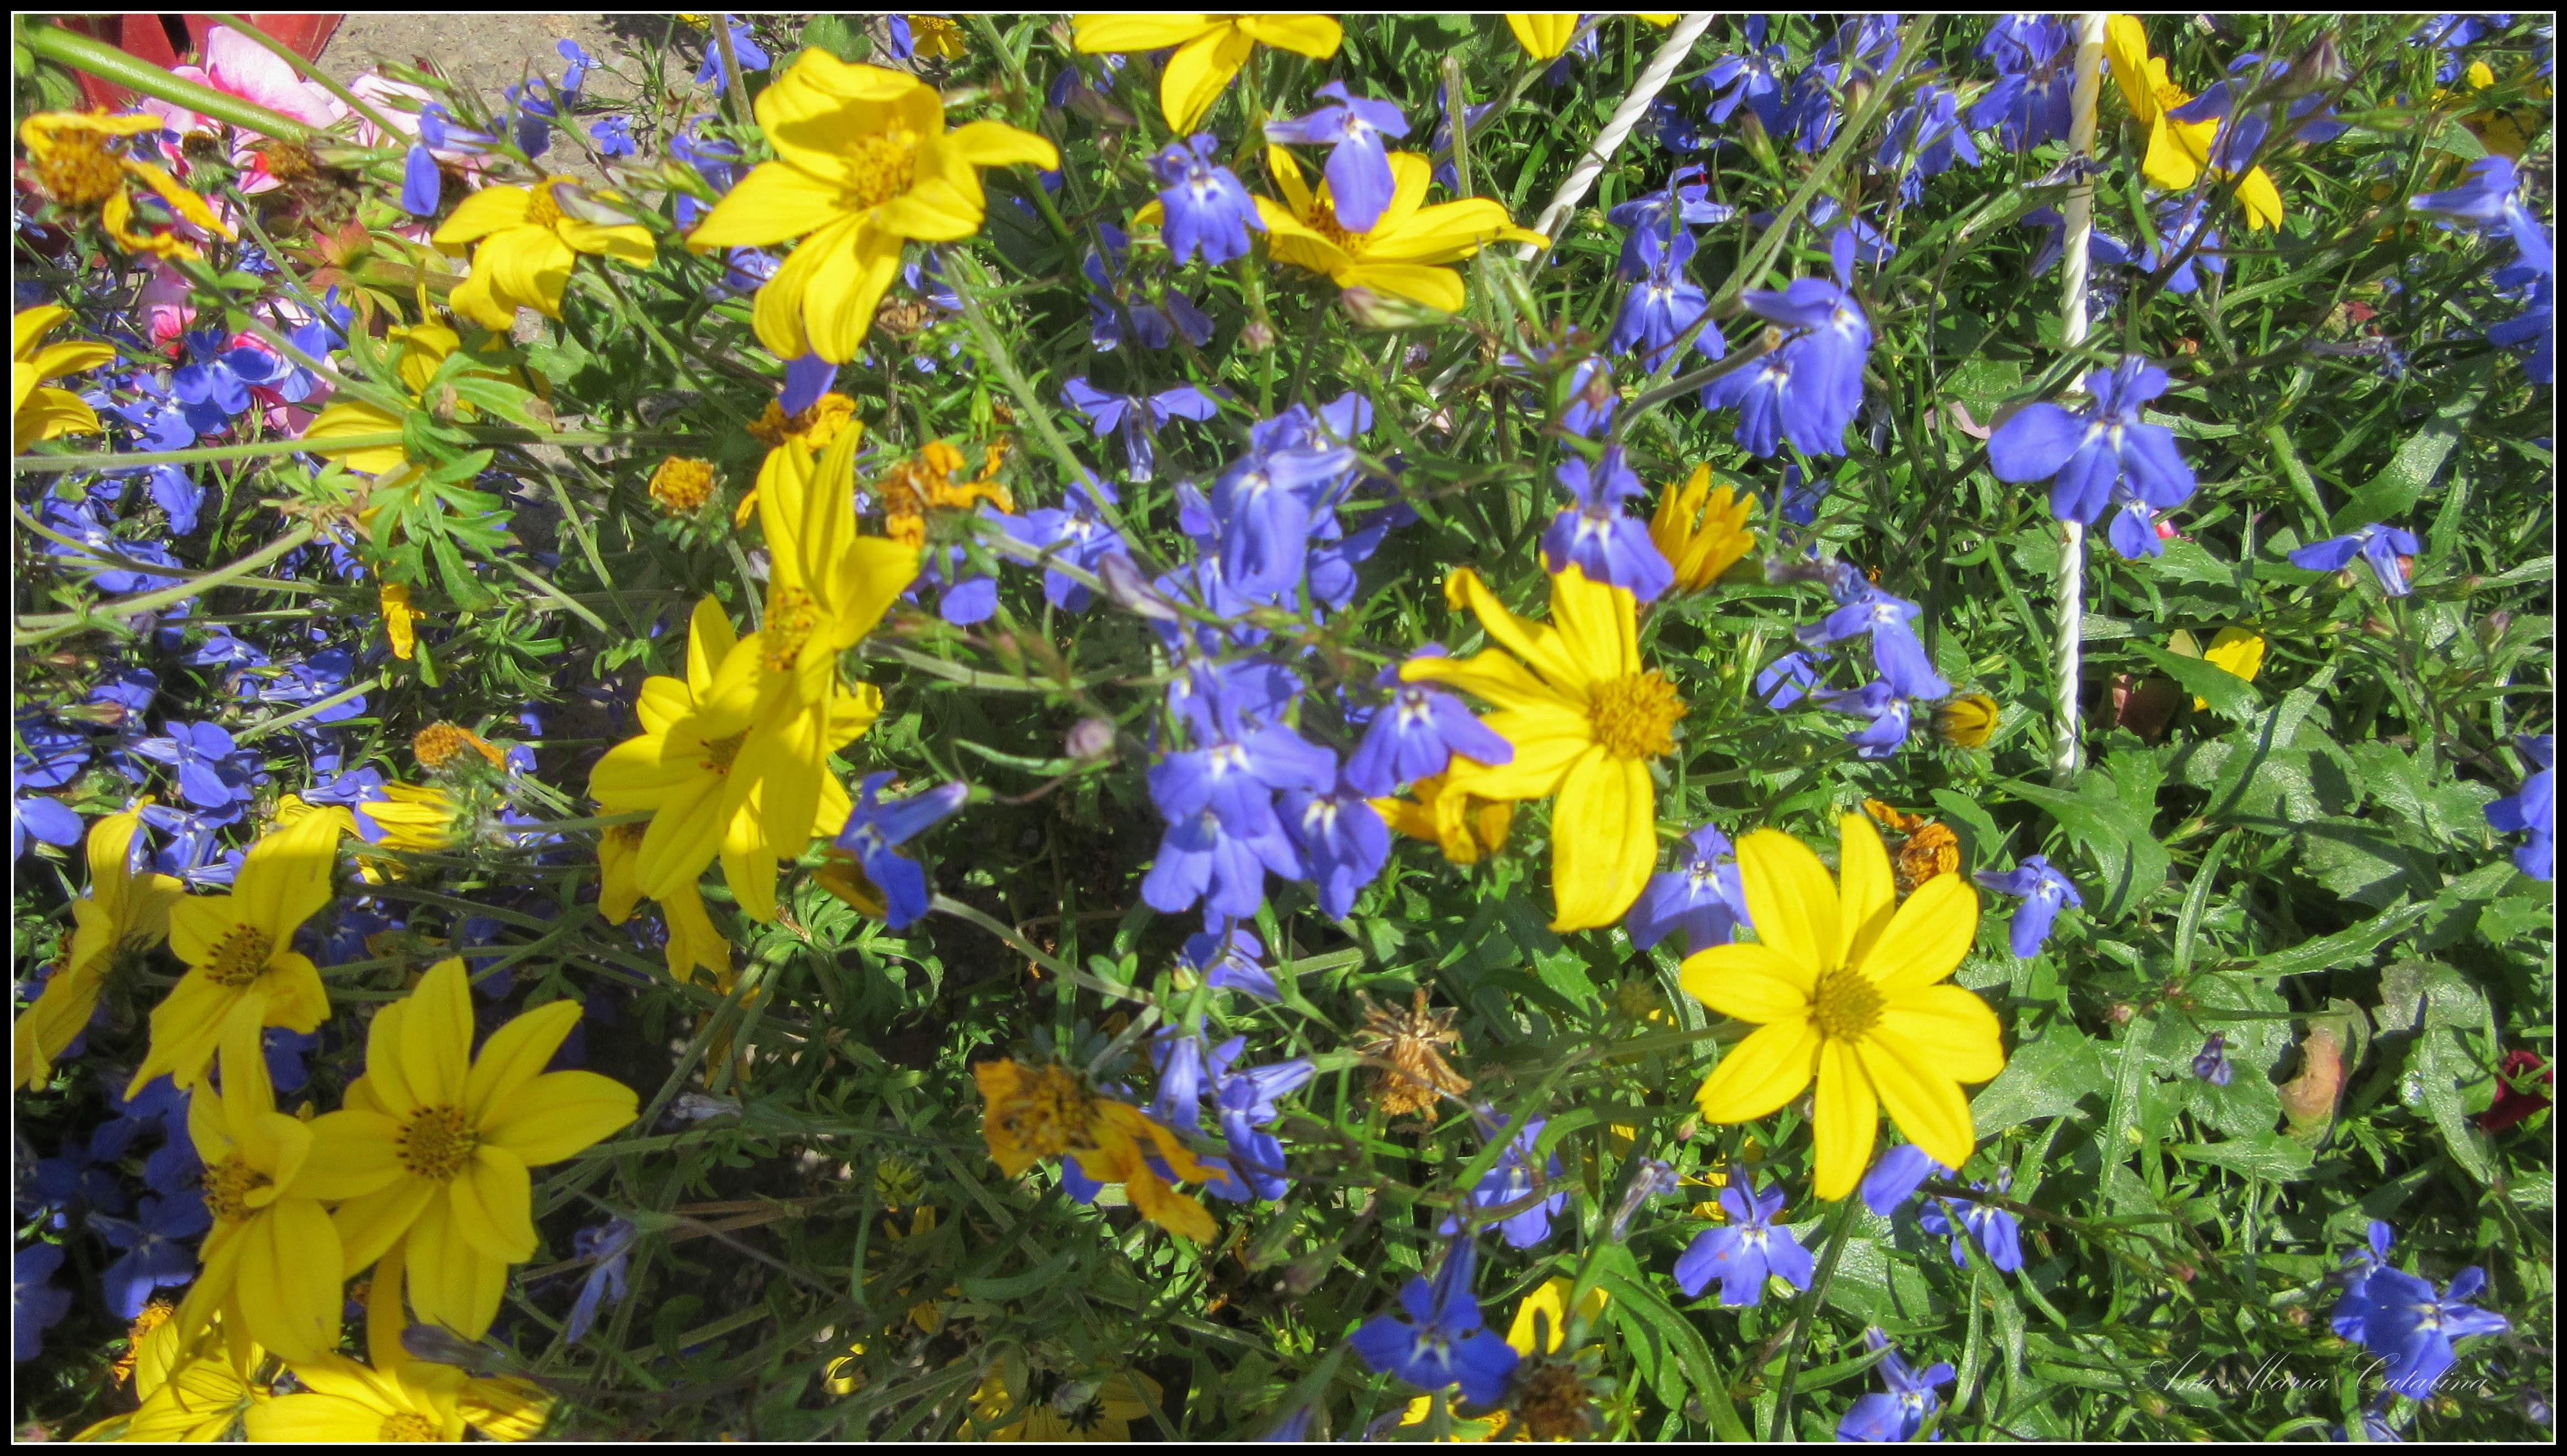 Photo: Bidens. - flori galbene - din Piata Centrla Agroalimentara - - 2017.05.27  album comun  http://ana-maria-catalina.blogspot.ro/2017/05/plante-diverse-din-comert.html